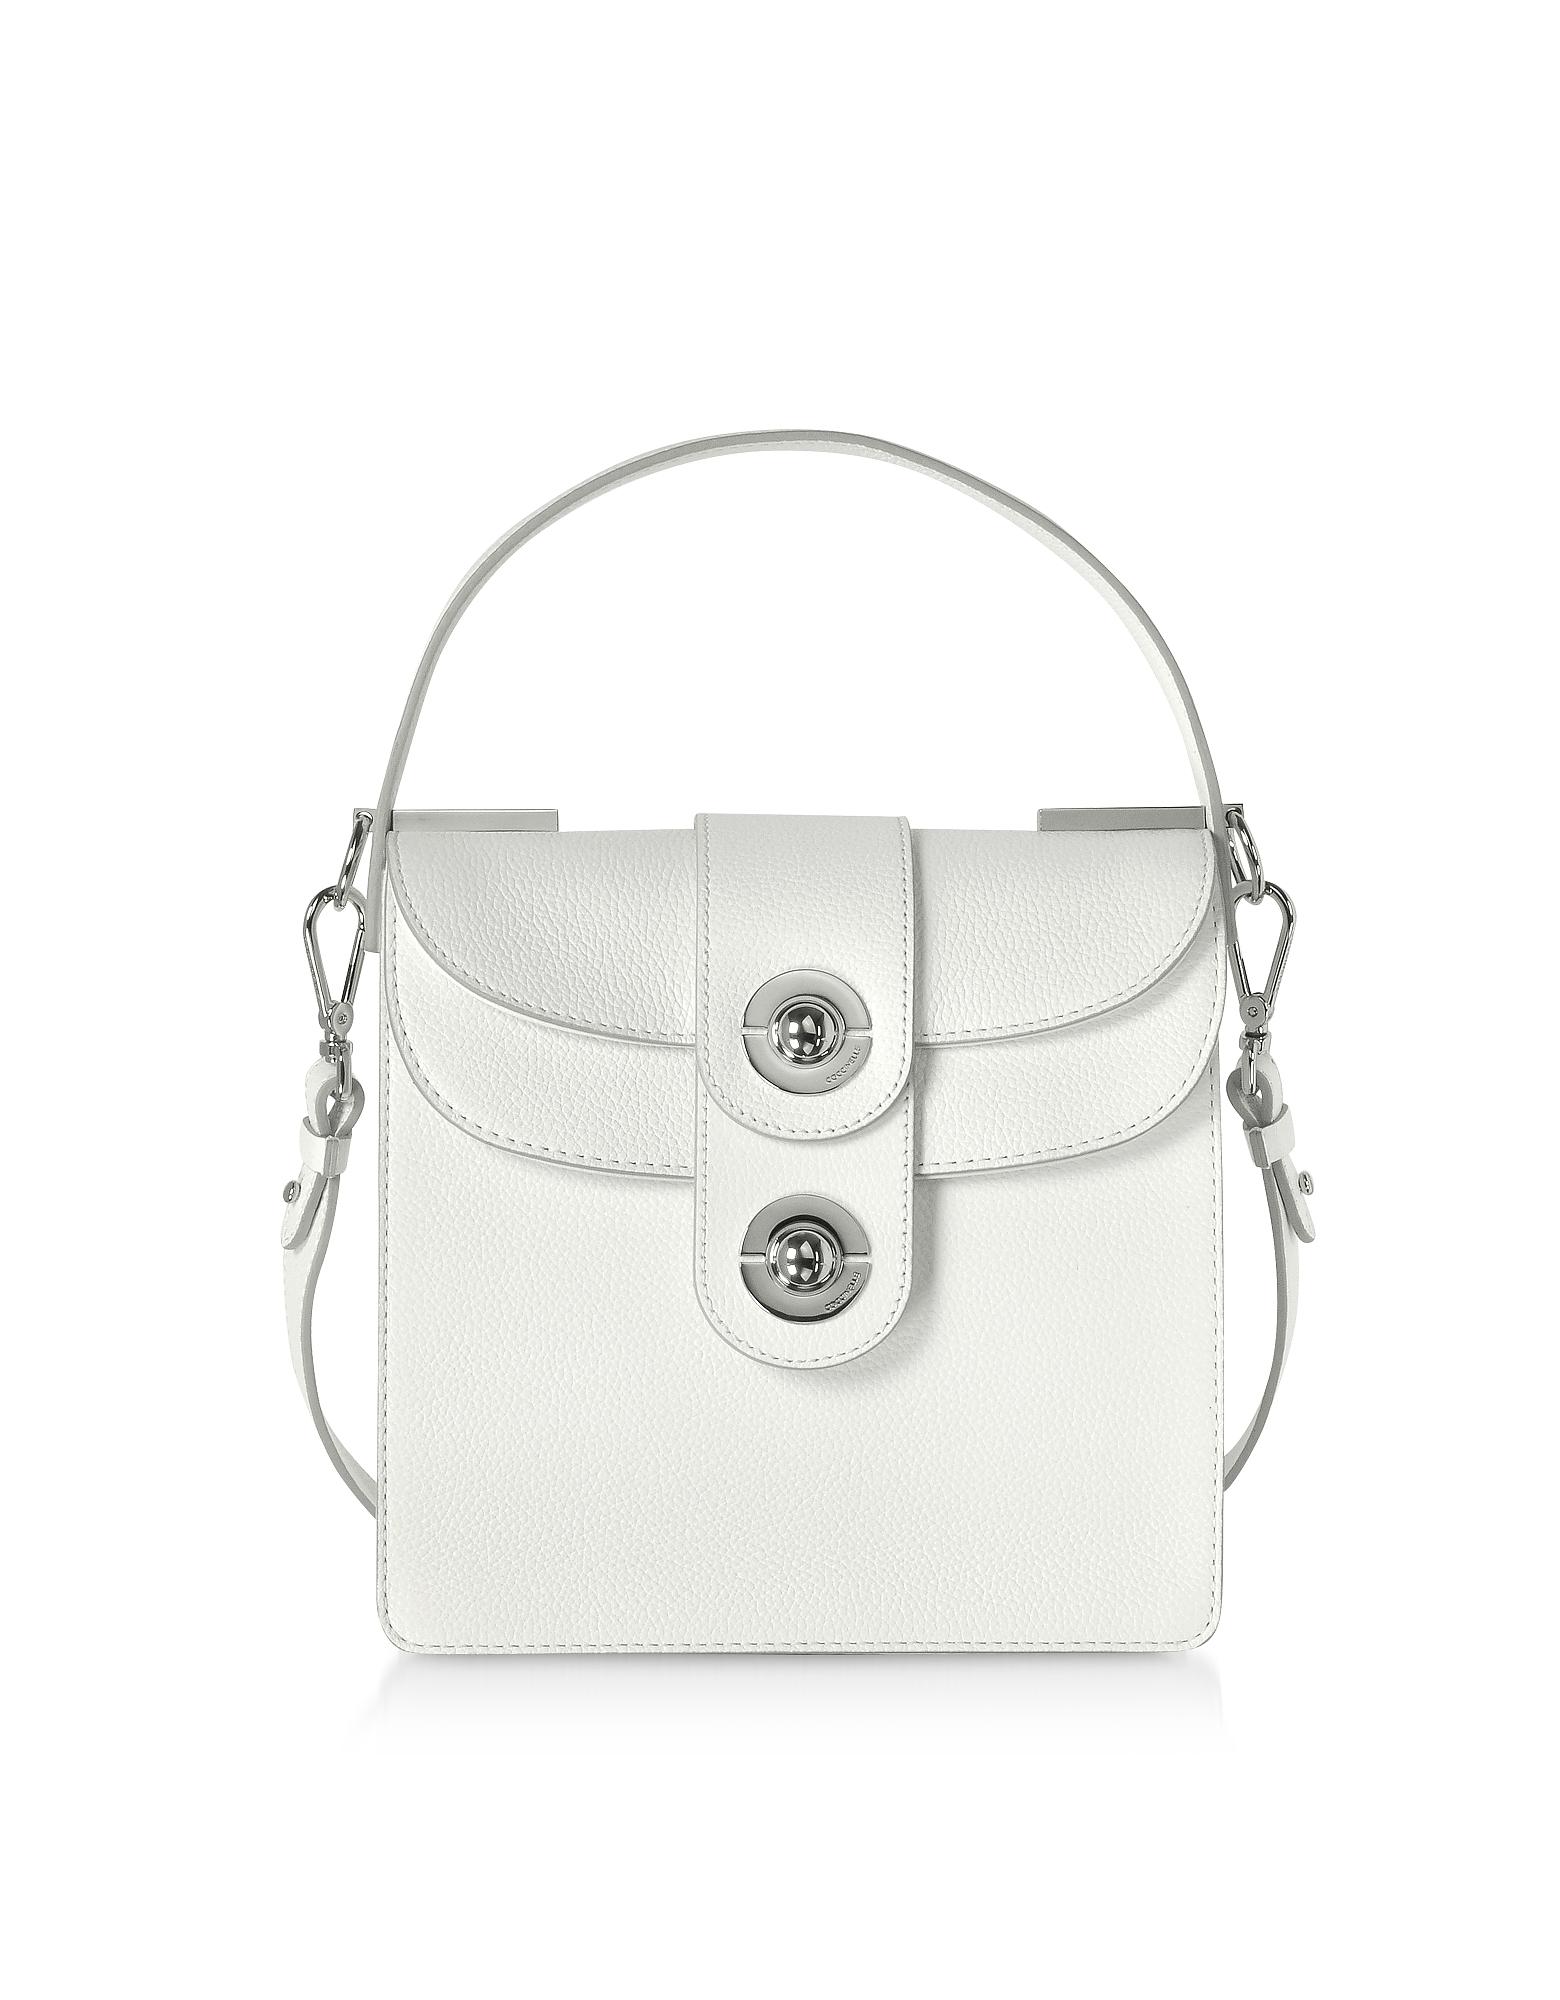 Coccinelle Handbags, Leila Leather Shoulder Bag